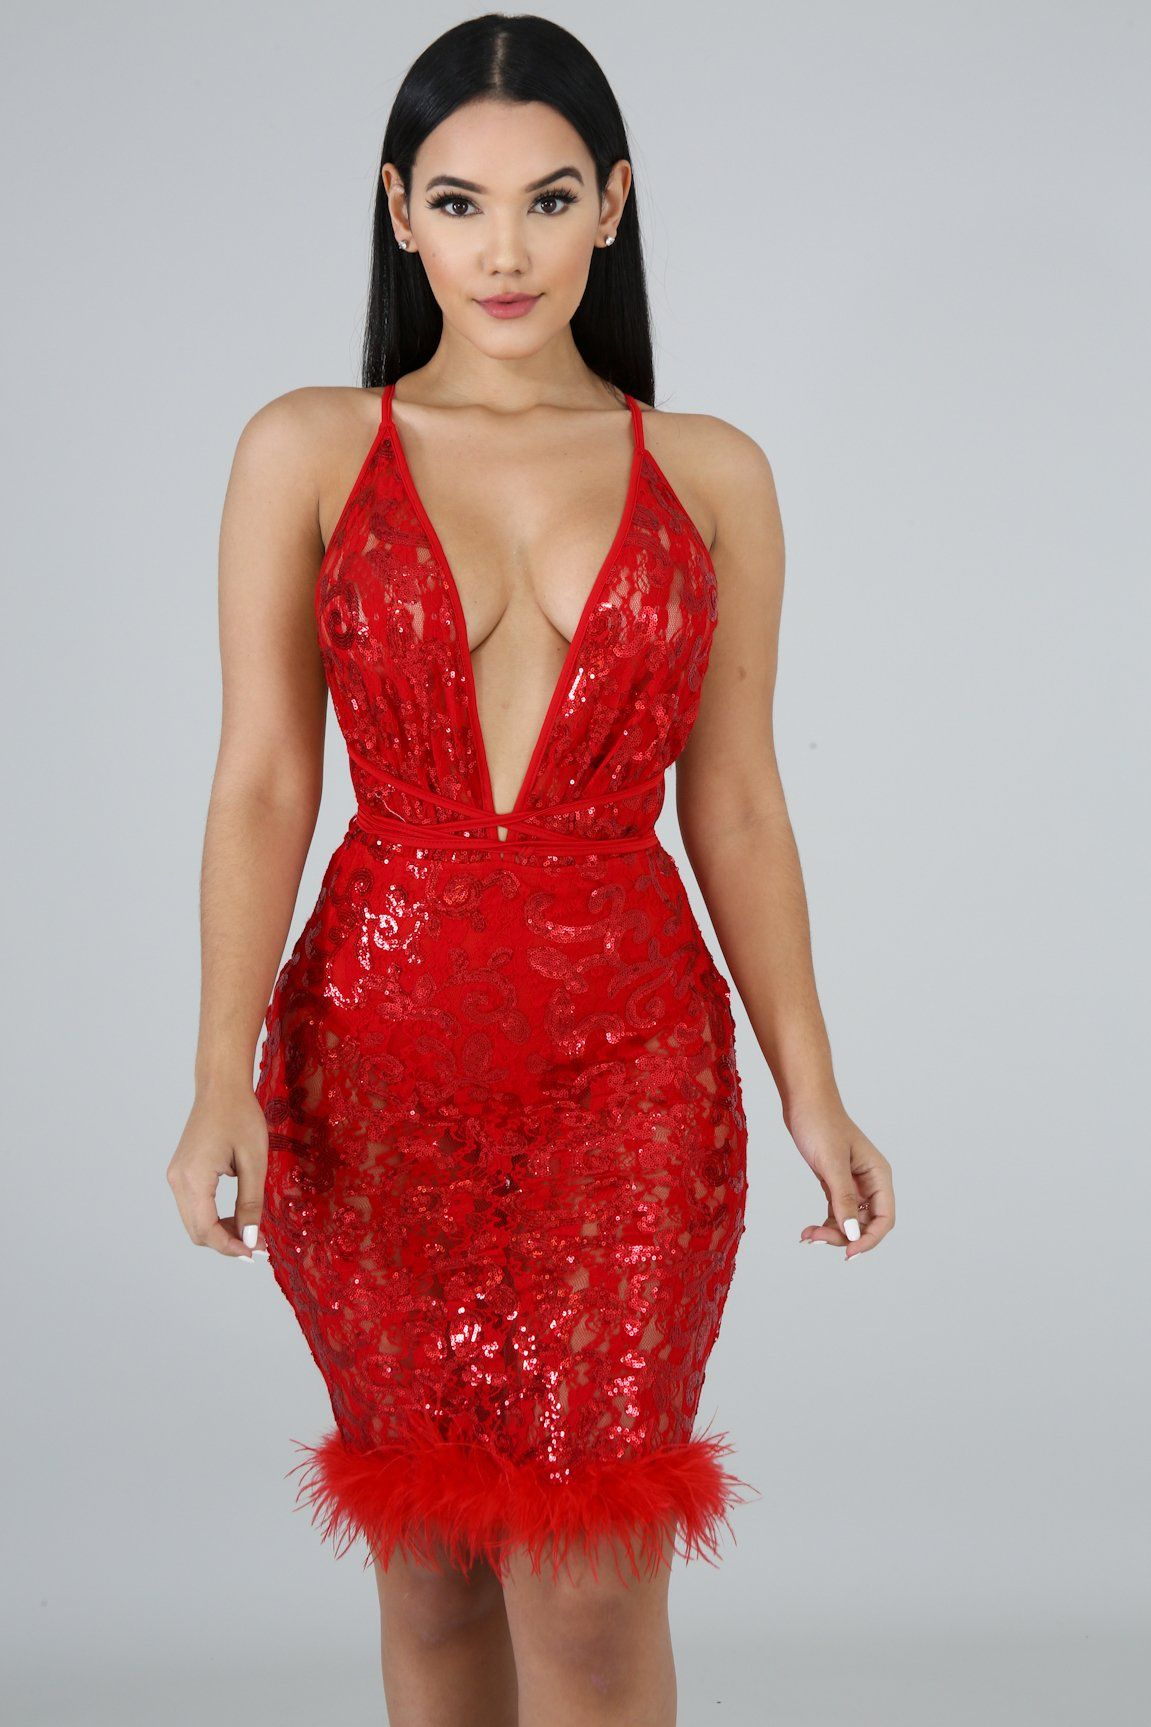 23+ Red birthday dress ideas